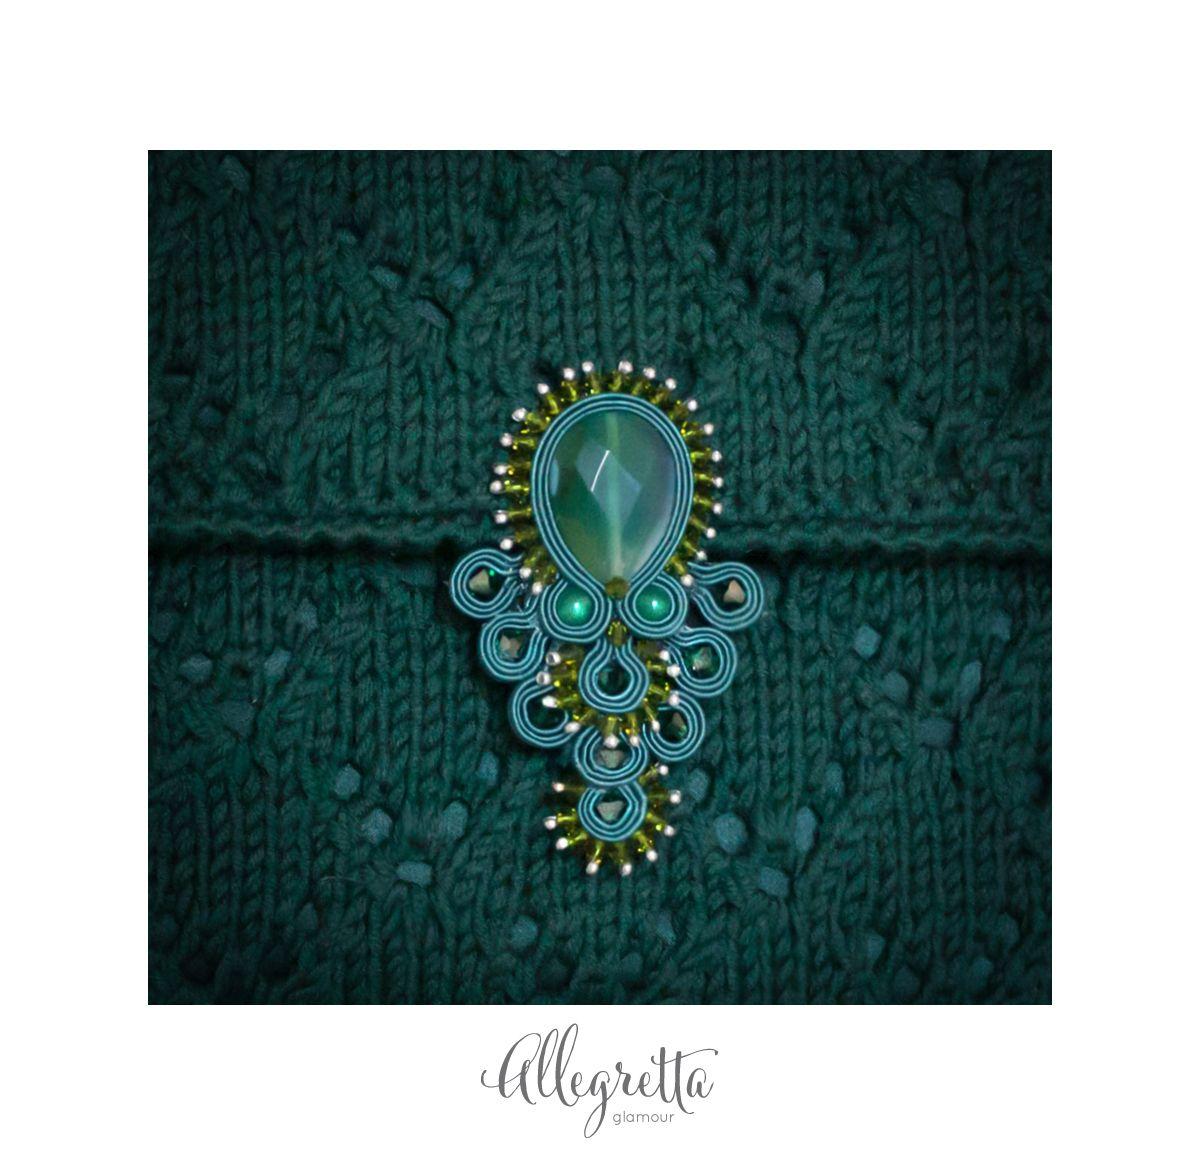 handmade u madeinitaly borse allegretta glamour pinterest